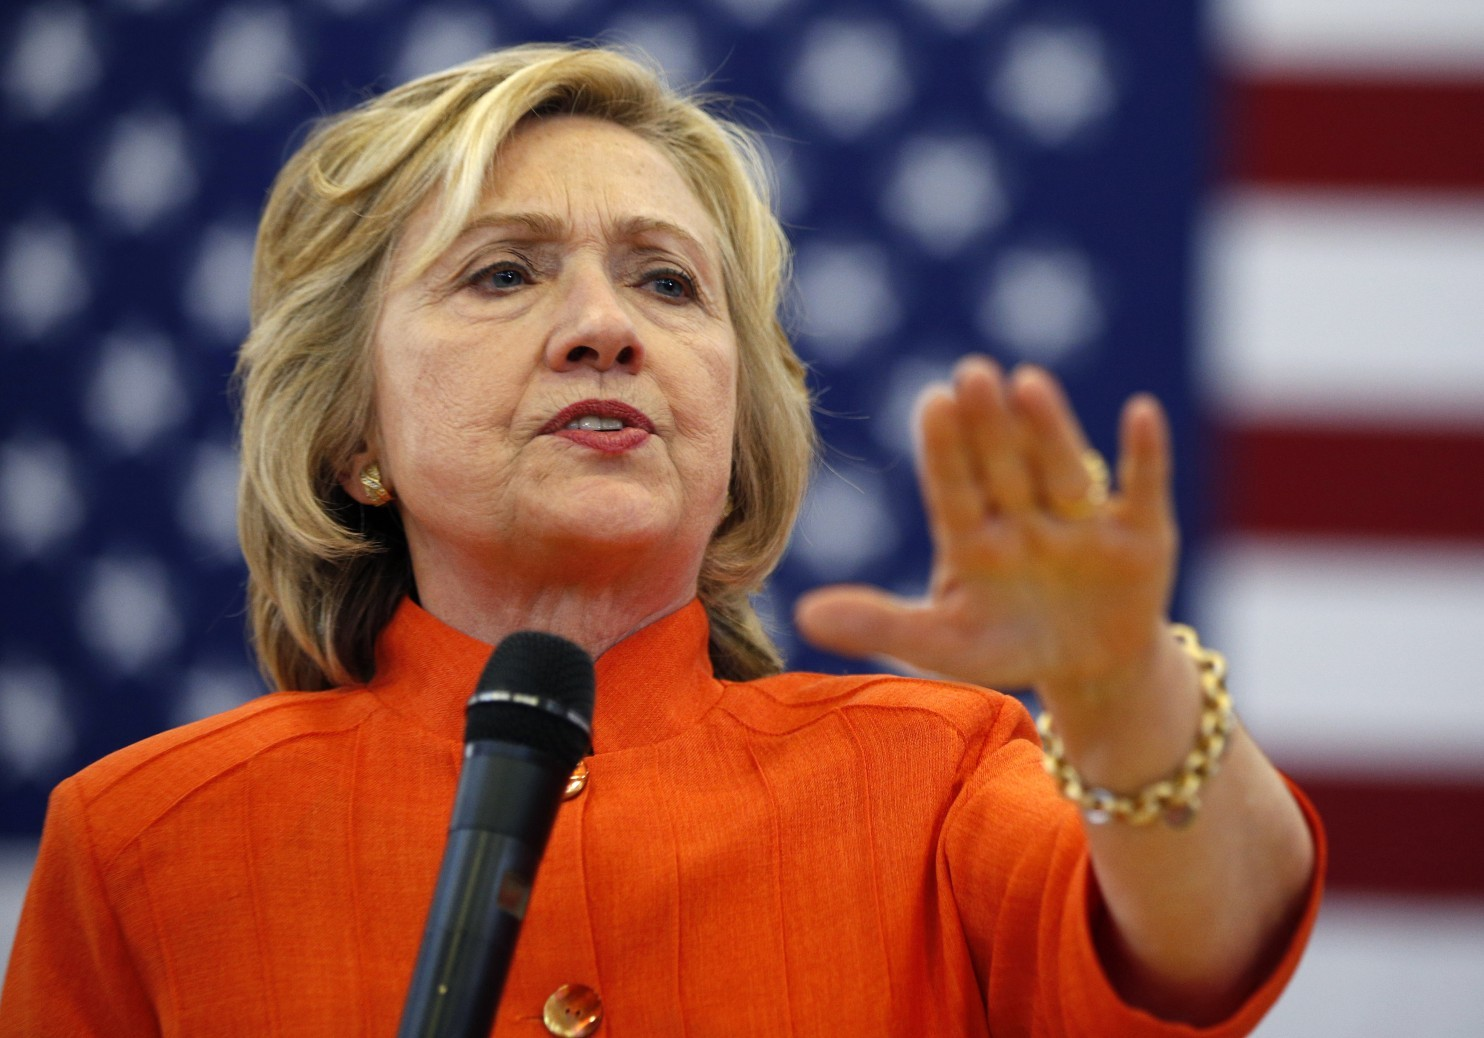 Birthing Services Clinton, Iowa (IA) - Mercy Medical Clinton Clinton clinic baby photos